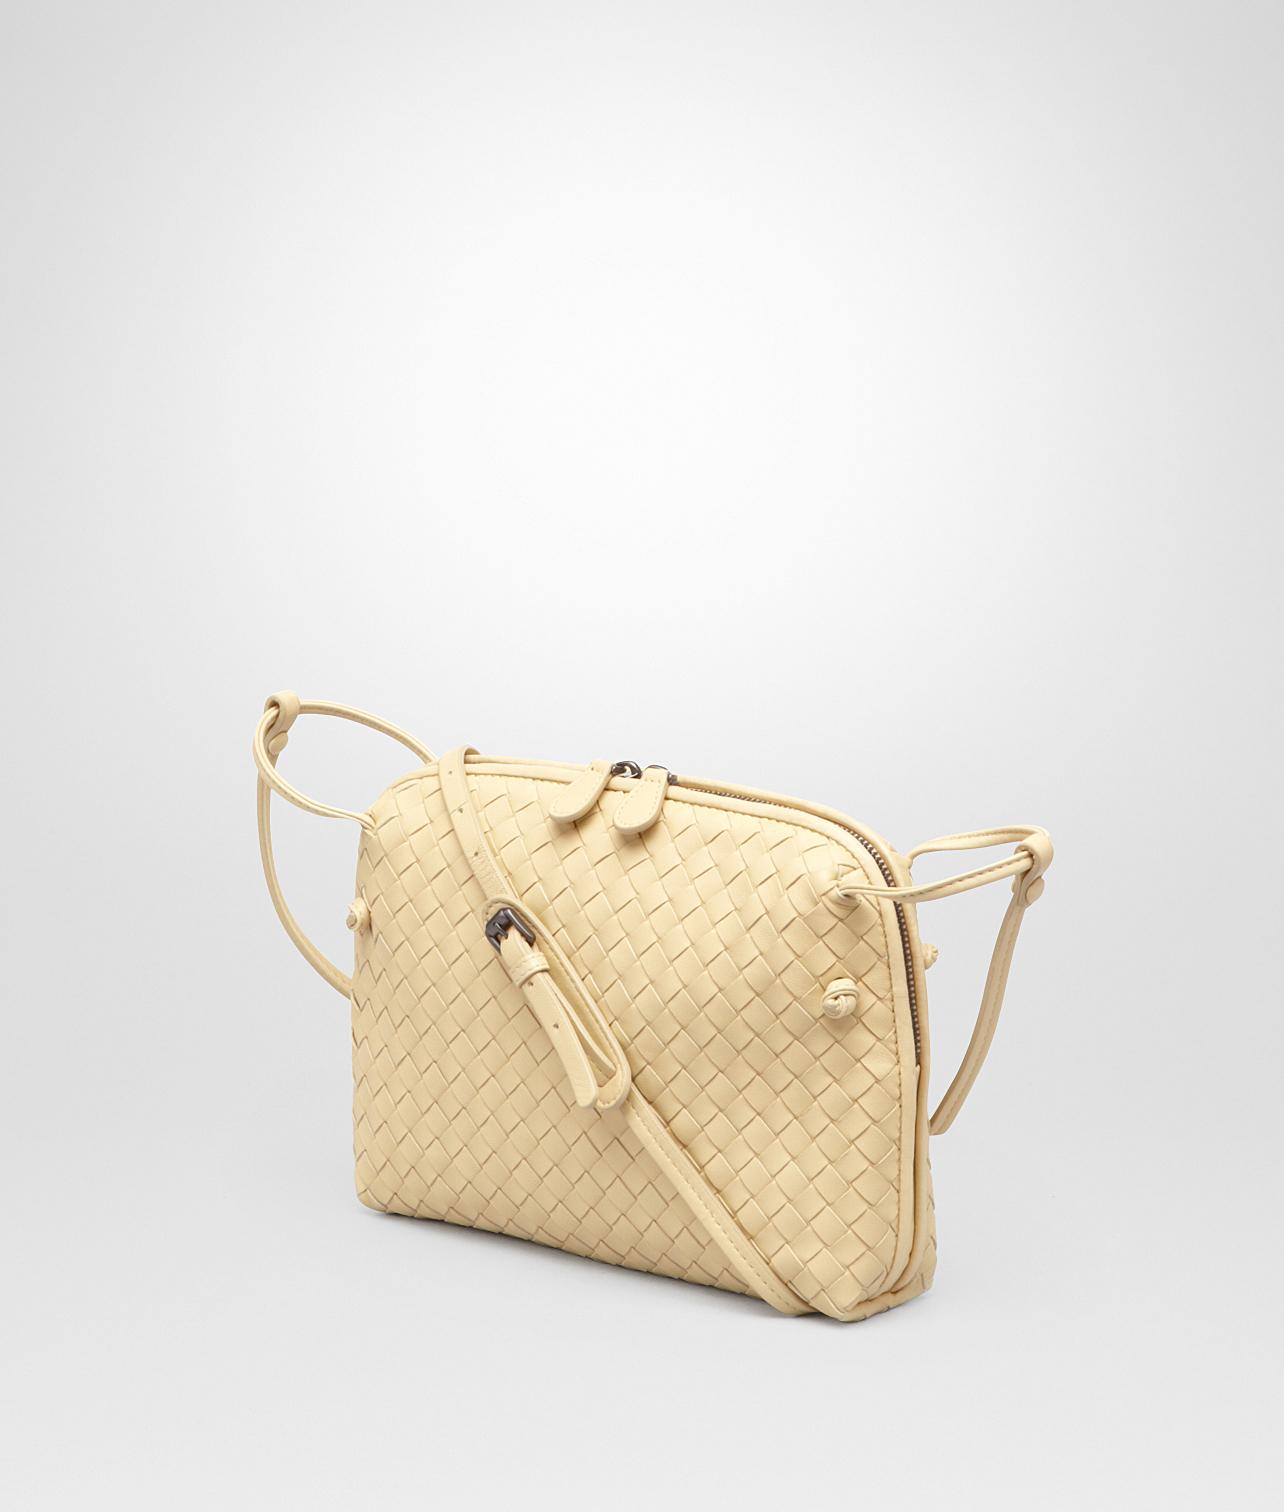 945f4cacfc1 Bottega Veneta Banane Intrecciato Nappa Messenger Bag in Natural - Lyst